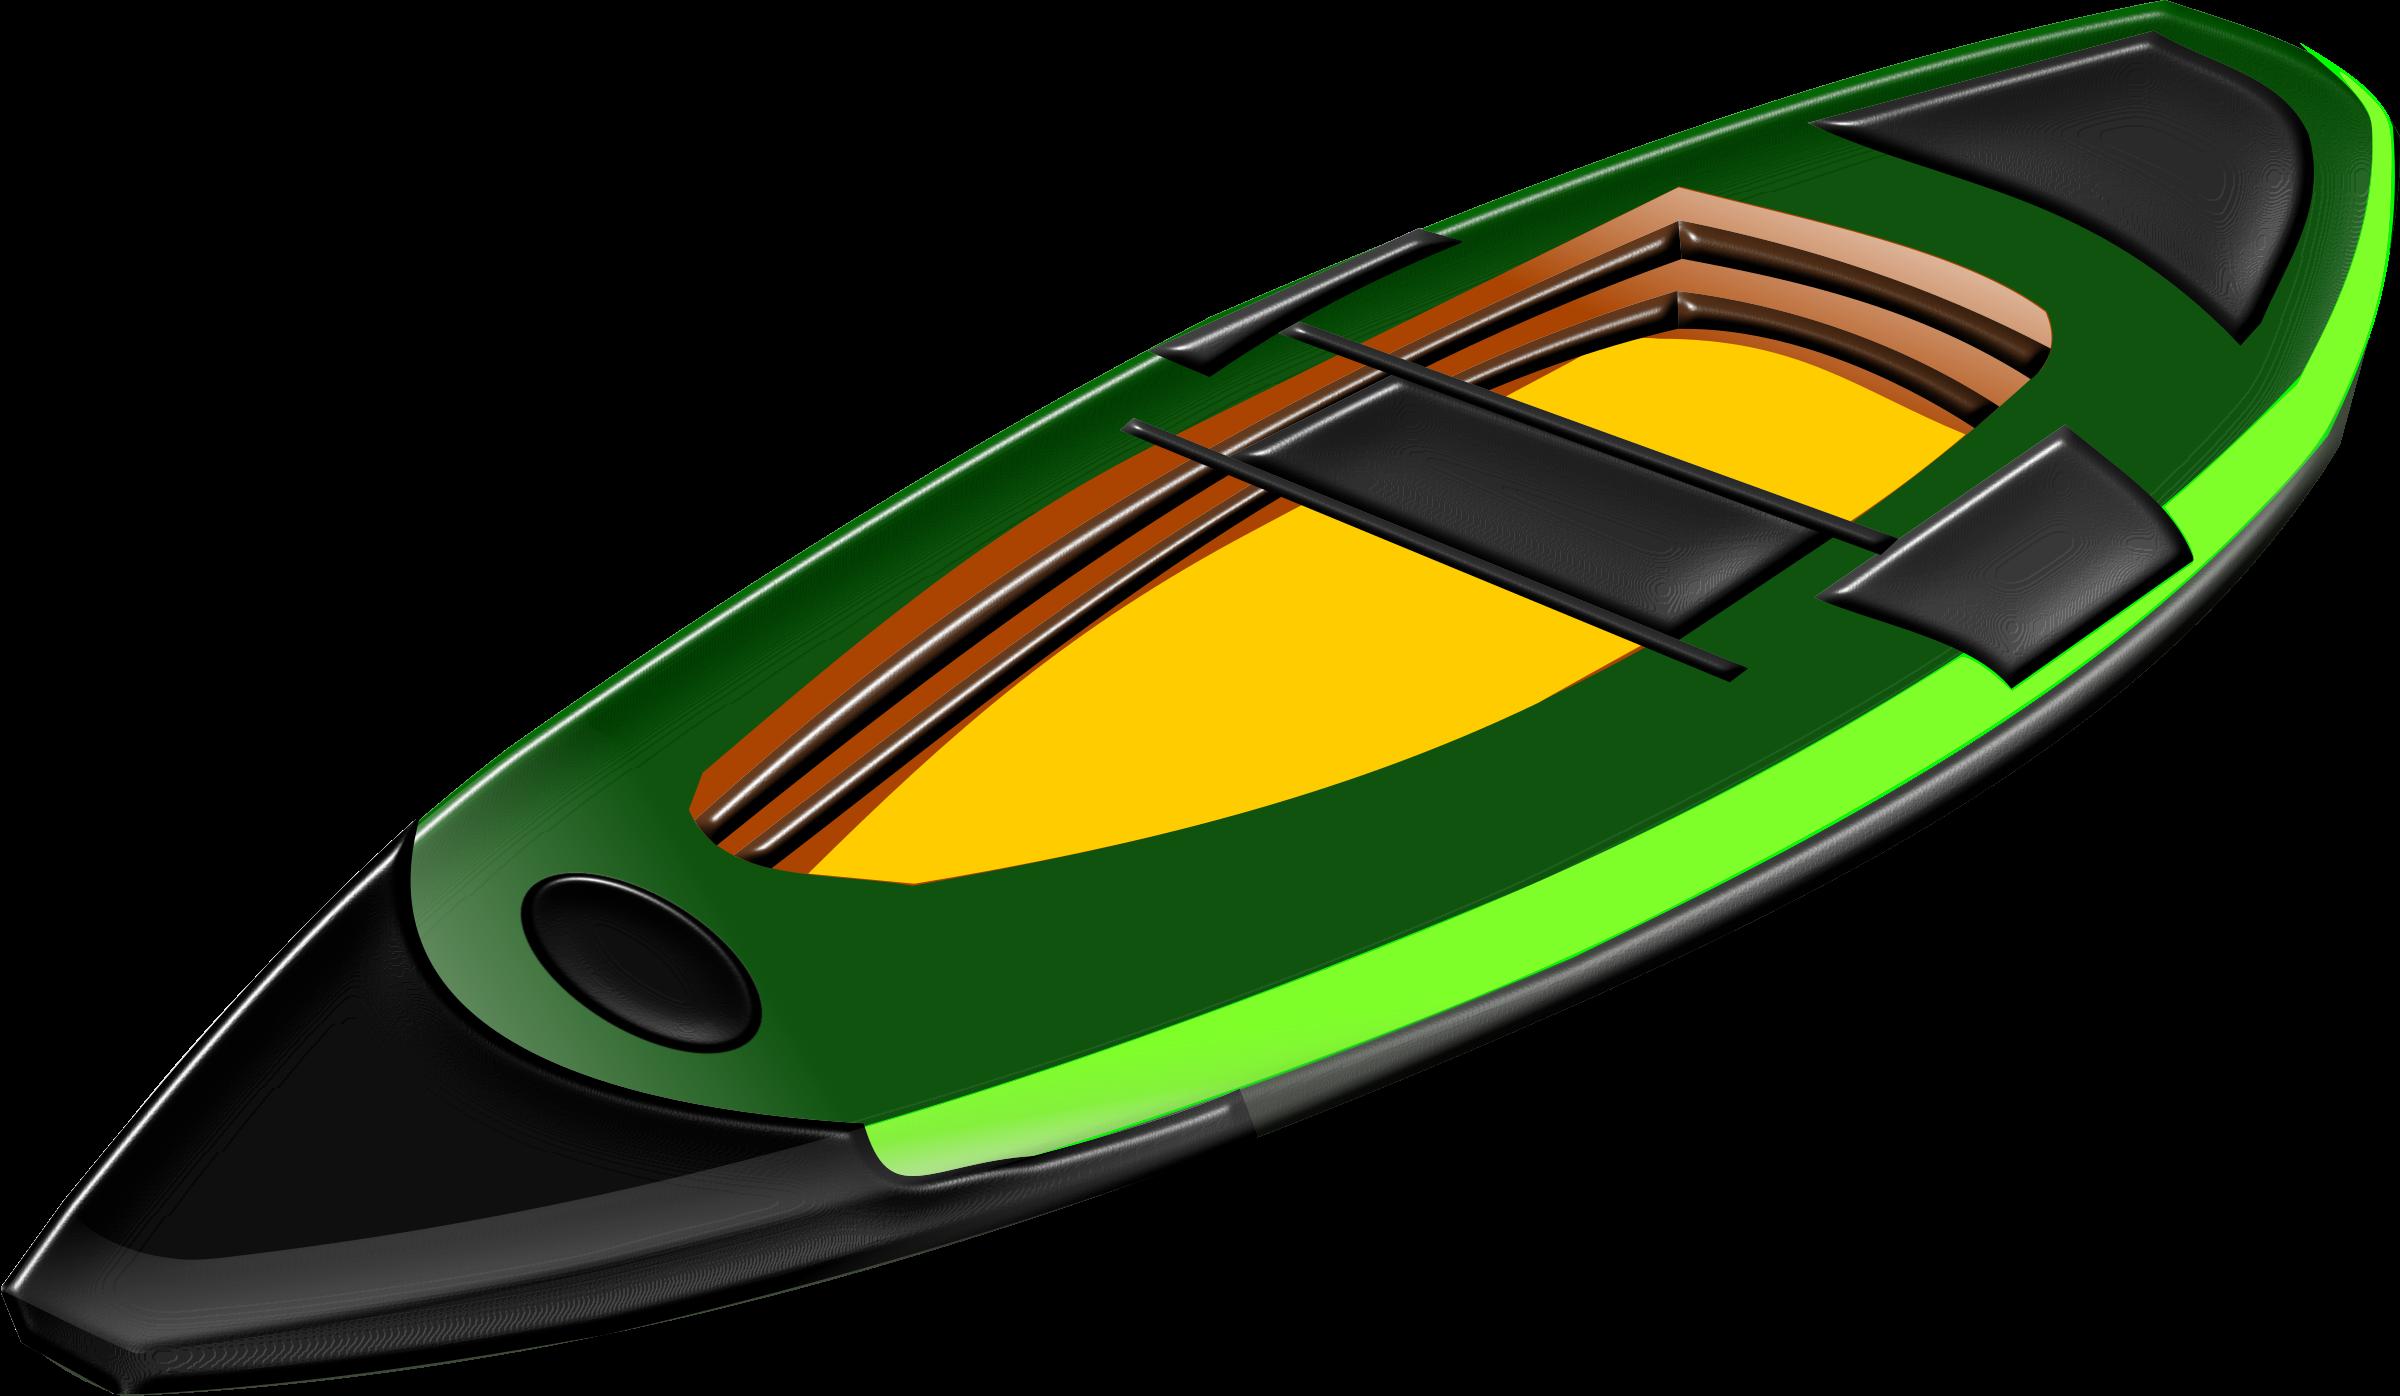 Big image png. Transportation clipart canoe